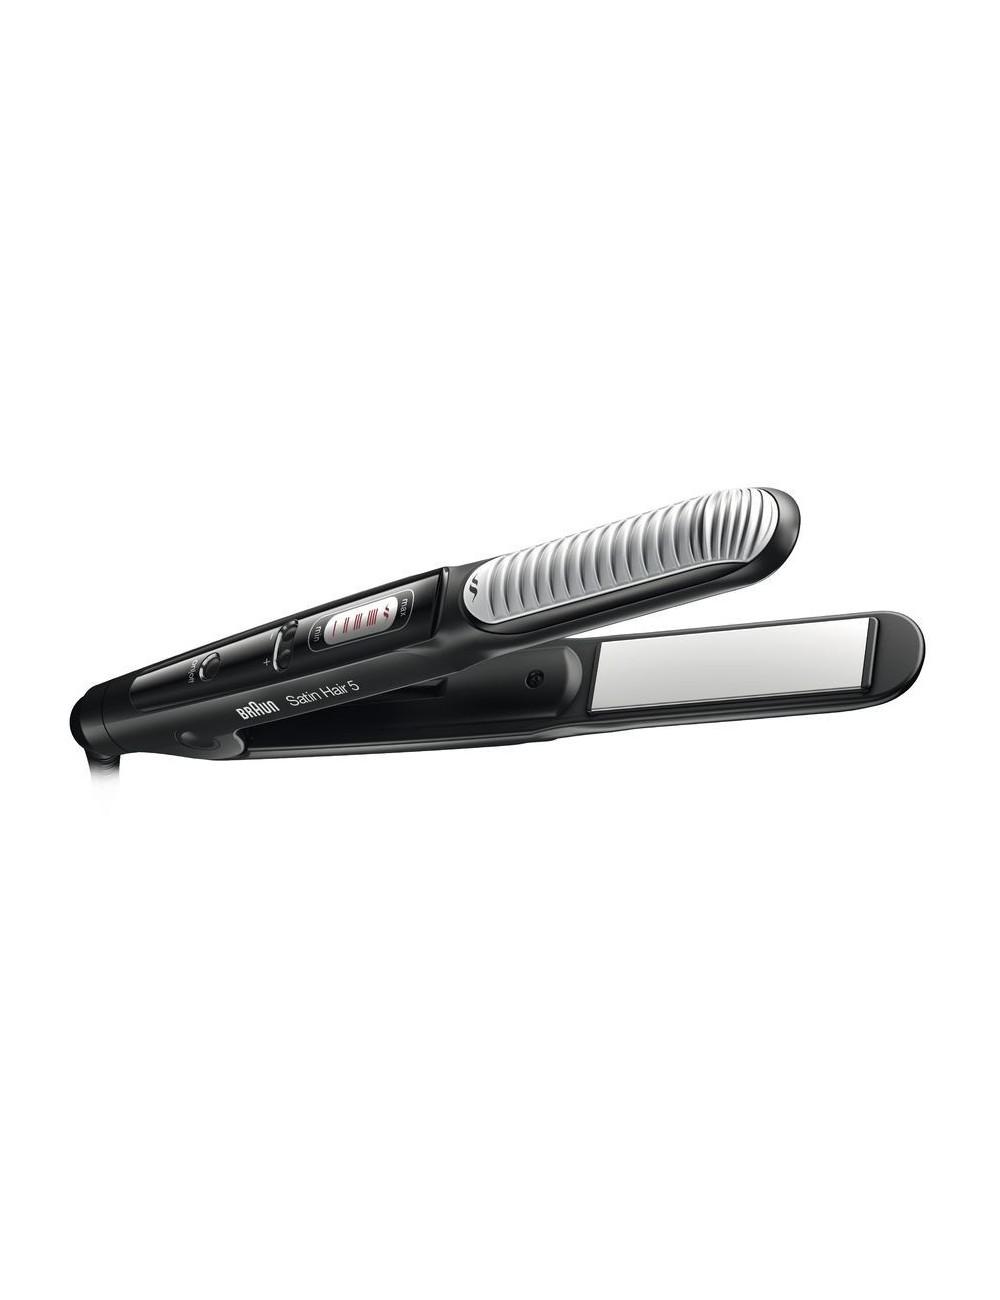 Plancha de pelo Braun Satin Hair ST550 Curl Shaper